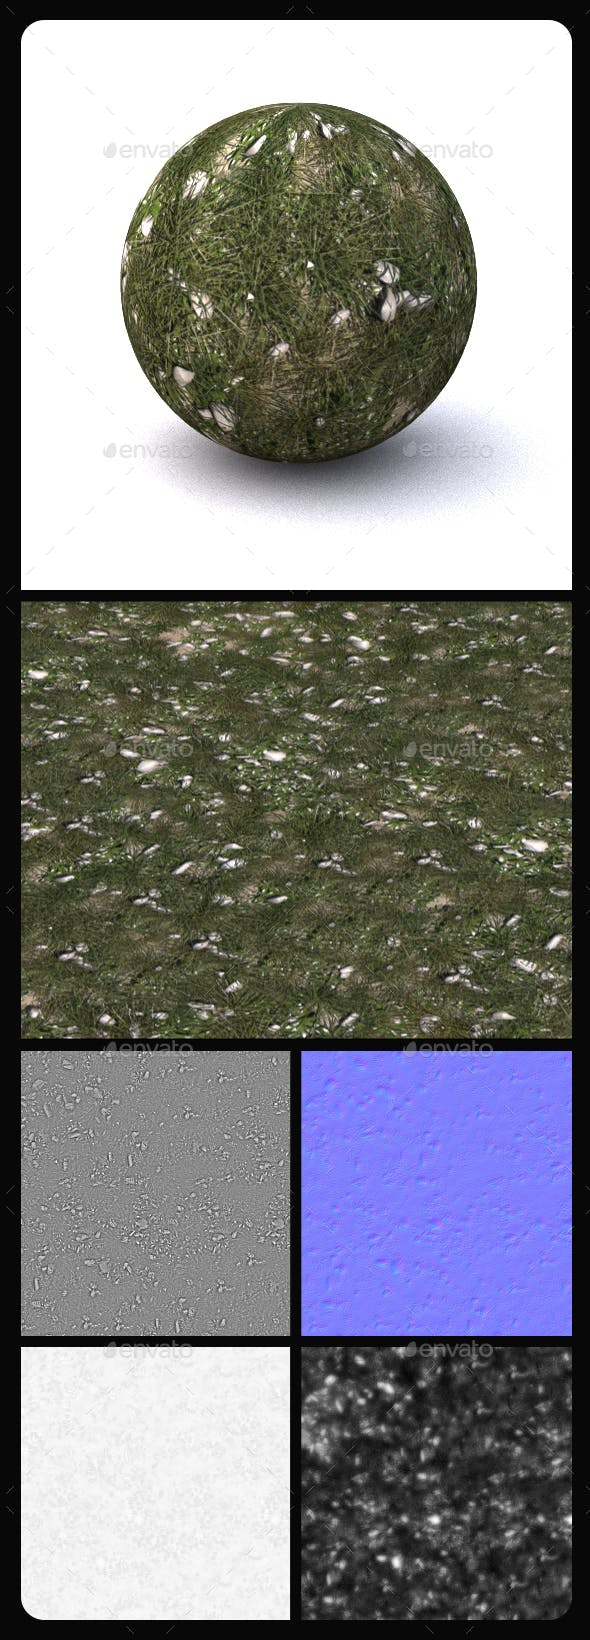 Grass Tile Texture 6 - 3DOcean Item for Sale